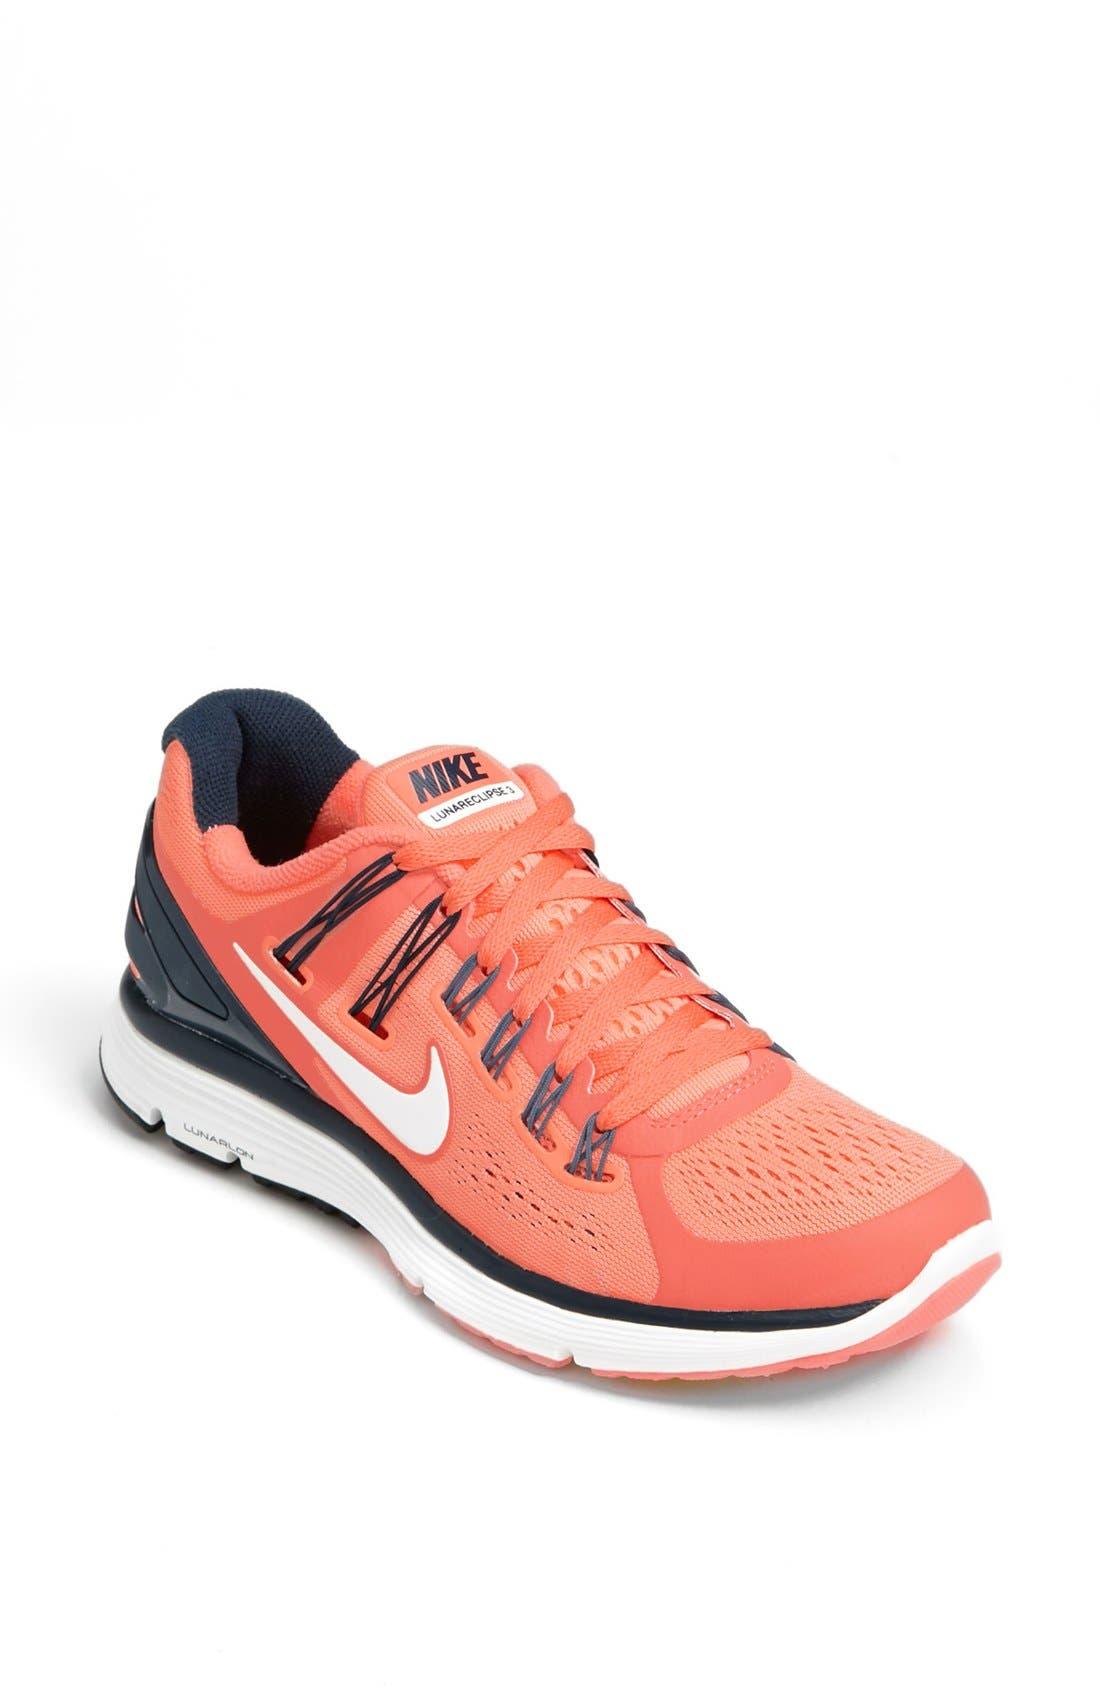 Alternate Image 1 Selected - Nike 'LunarEclipse+ 3' Running Shoe (Women)